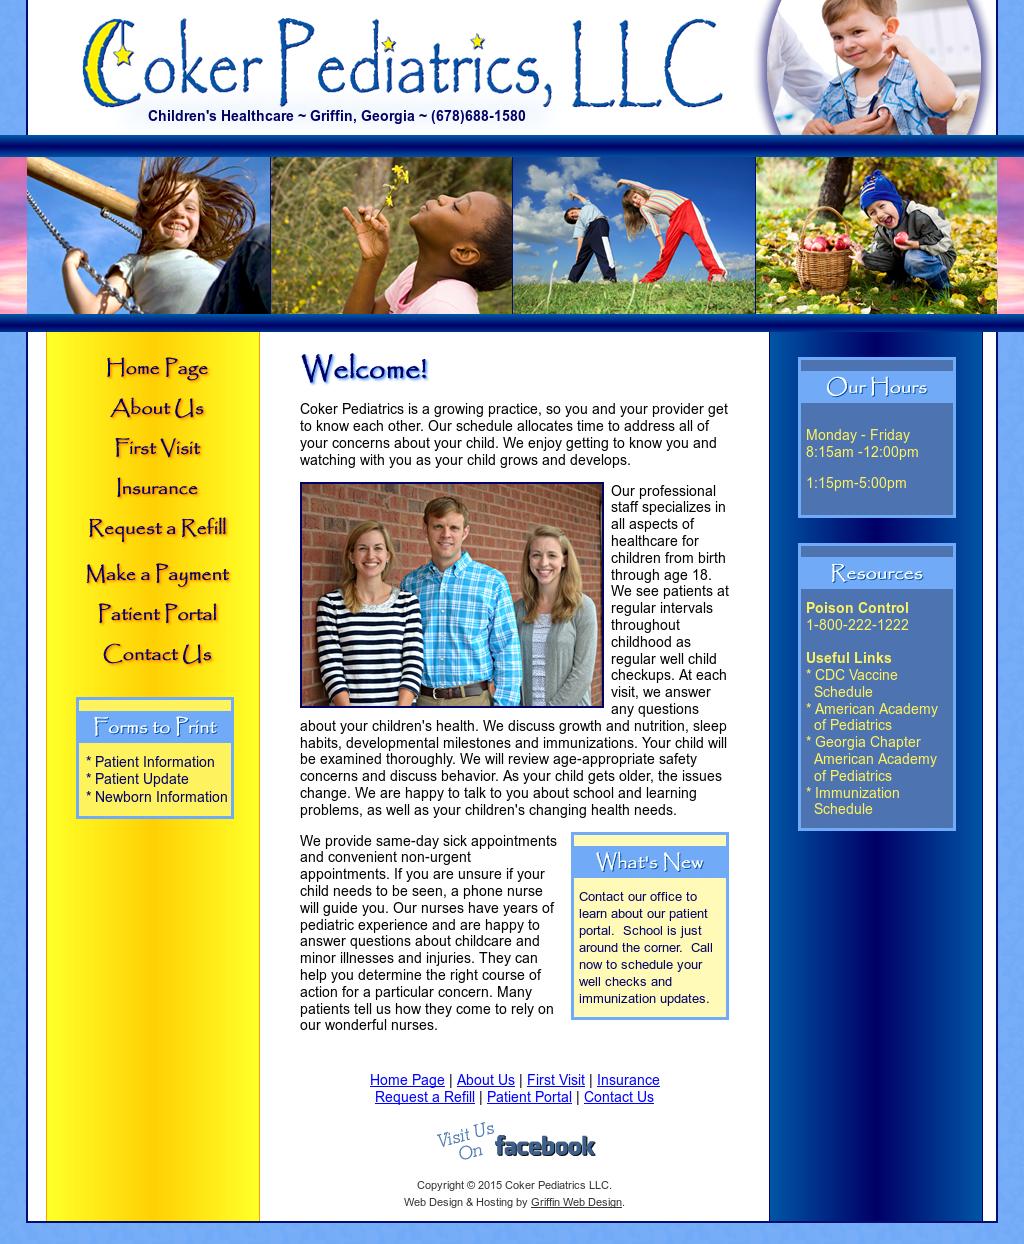 Coker Pediatrics Competitors, Revenue and Employees - Owler Company